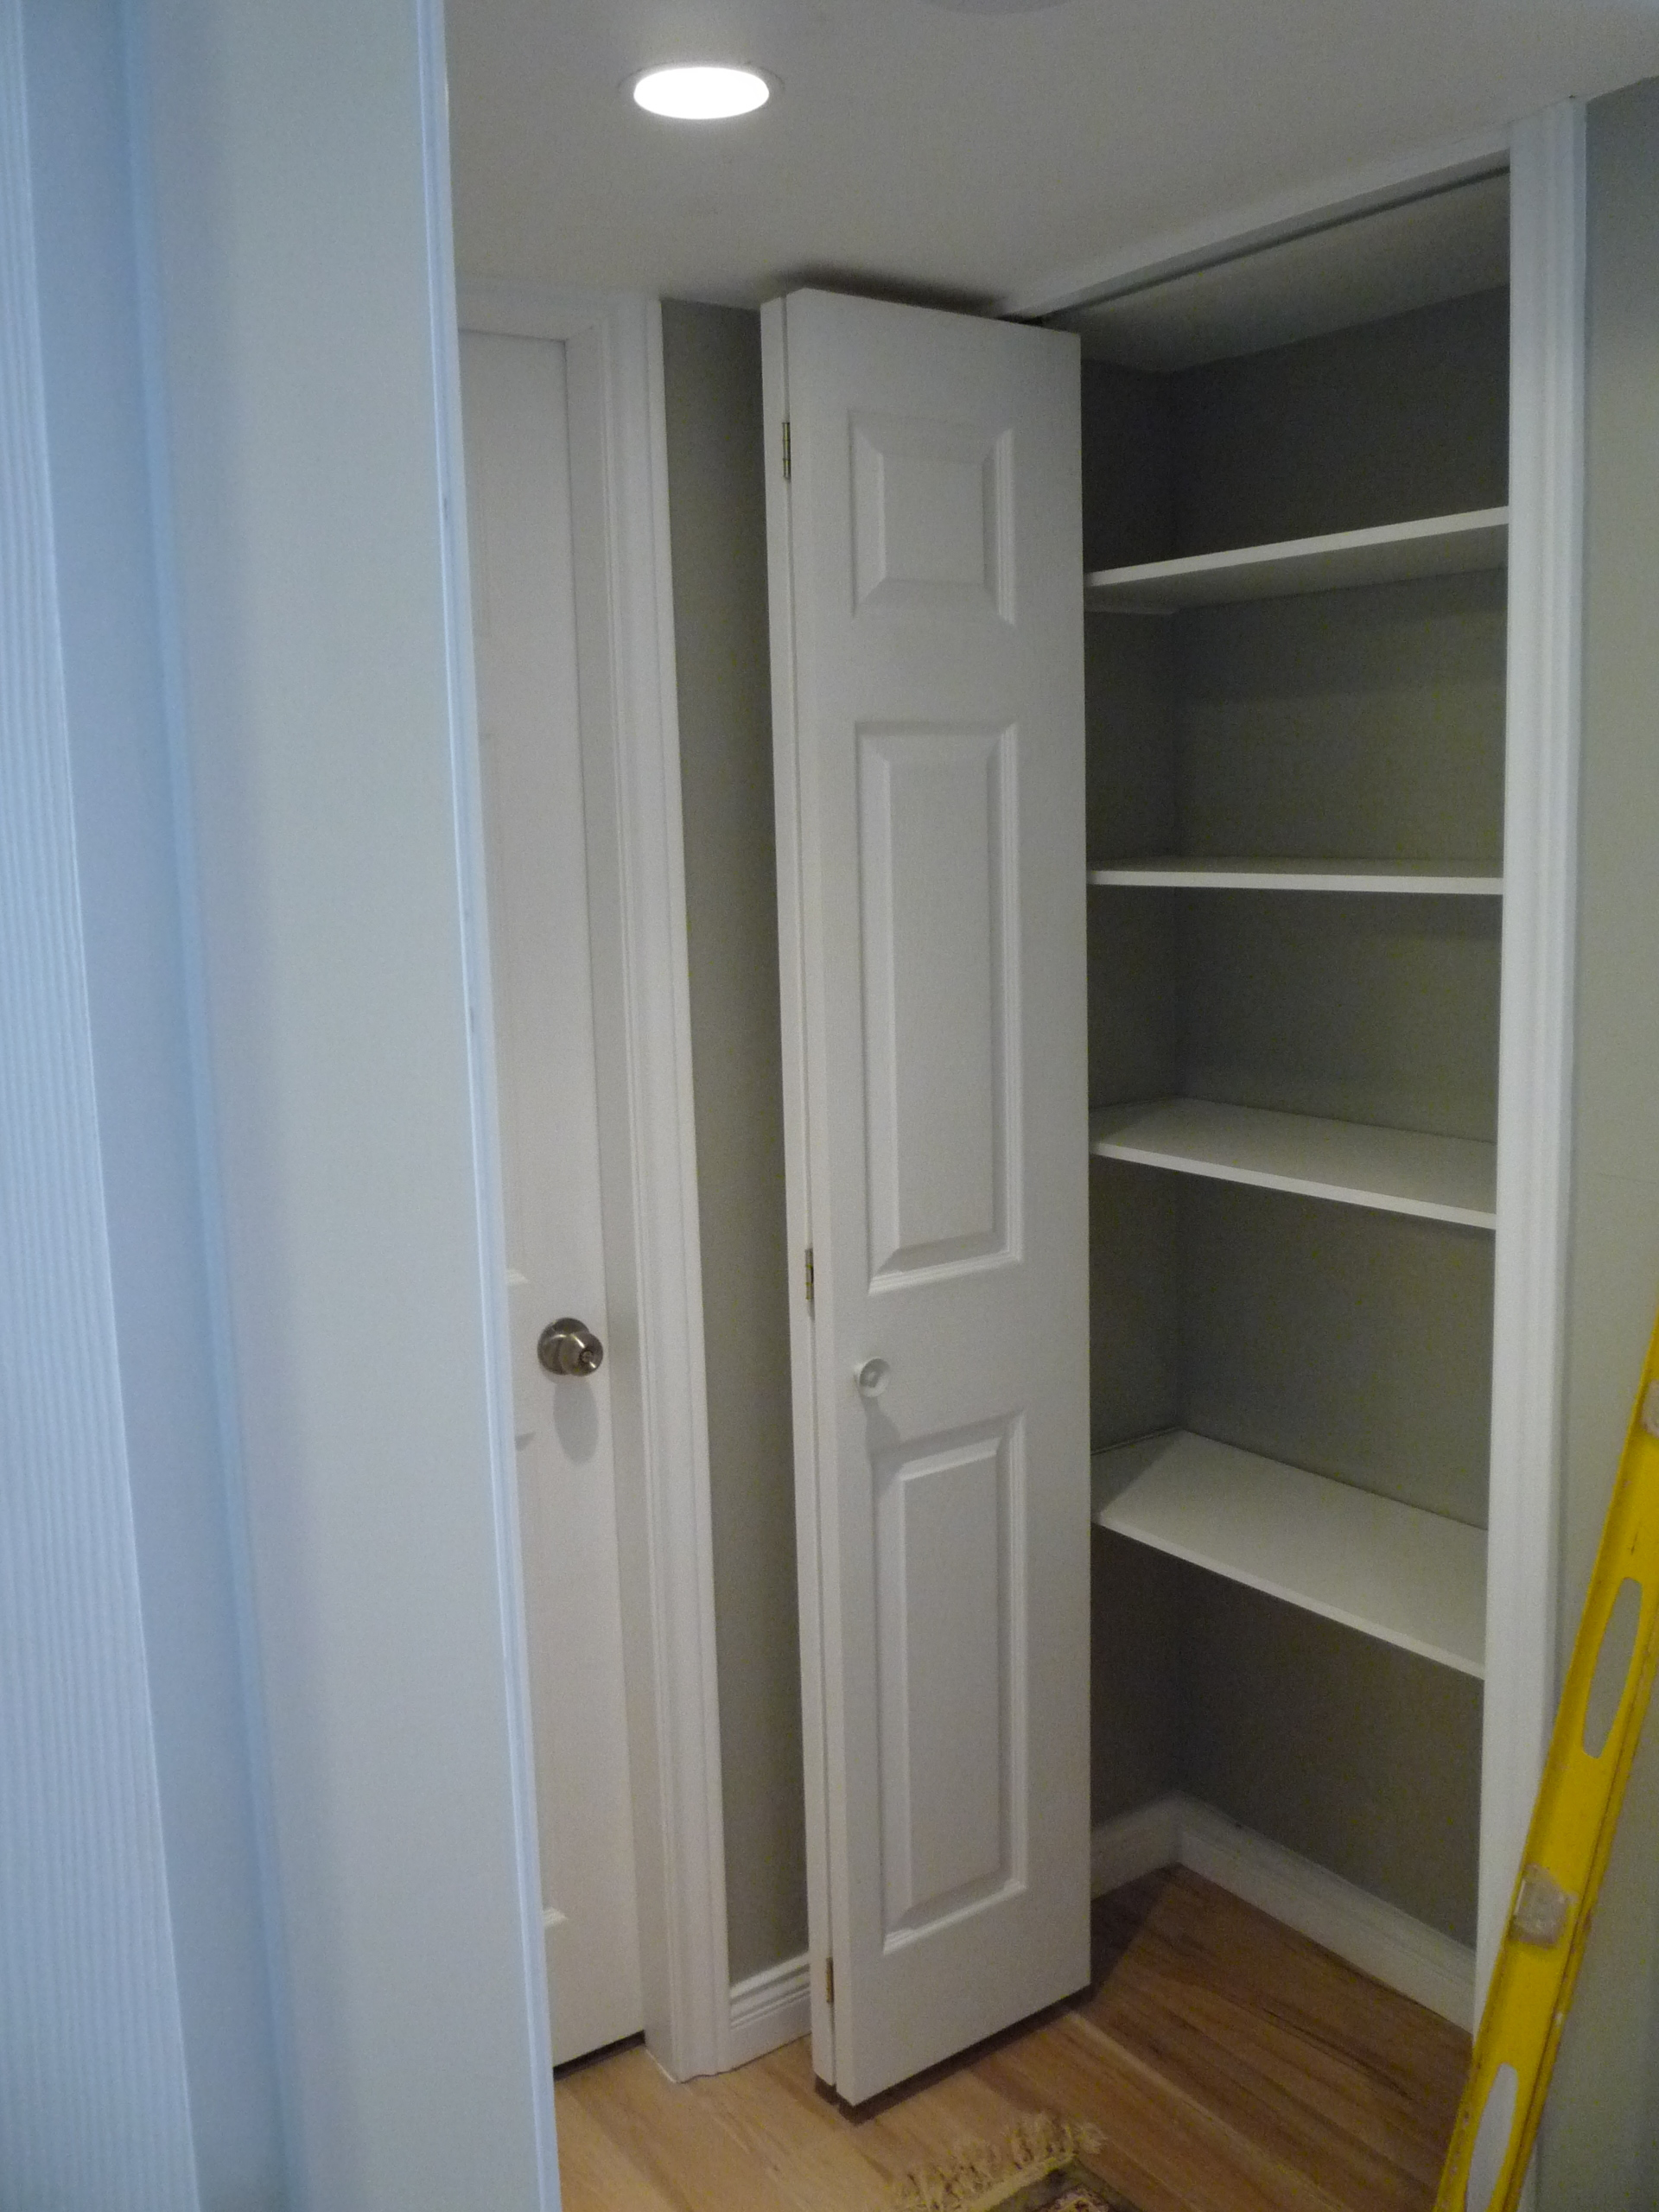 Linen Closet with Interior Shelf Organizers